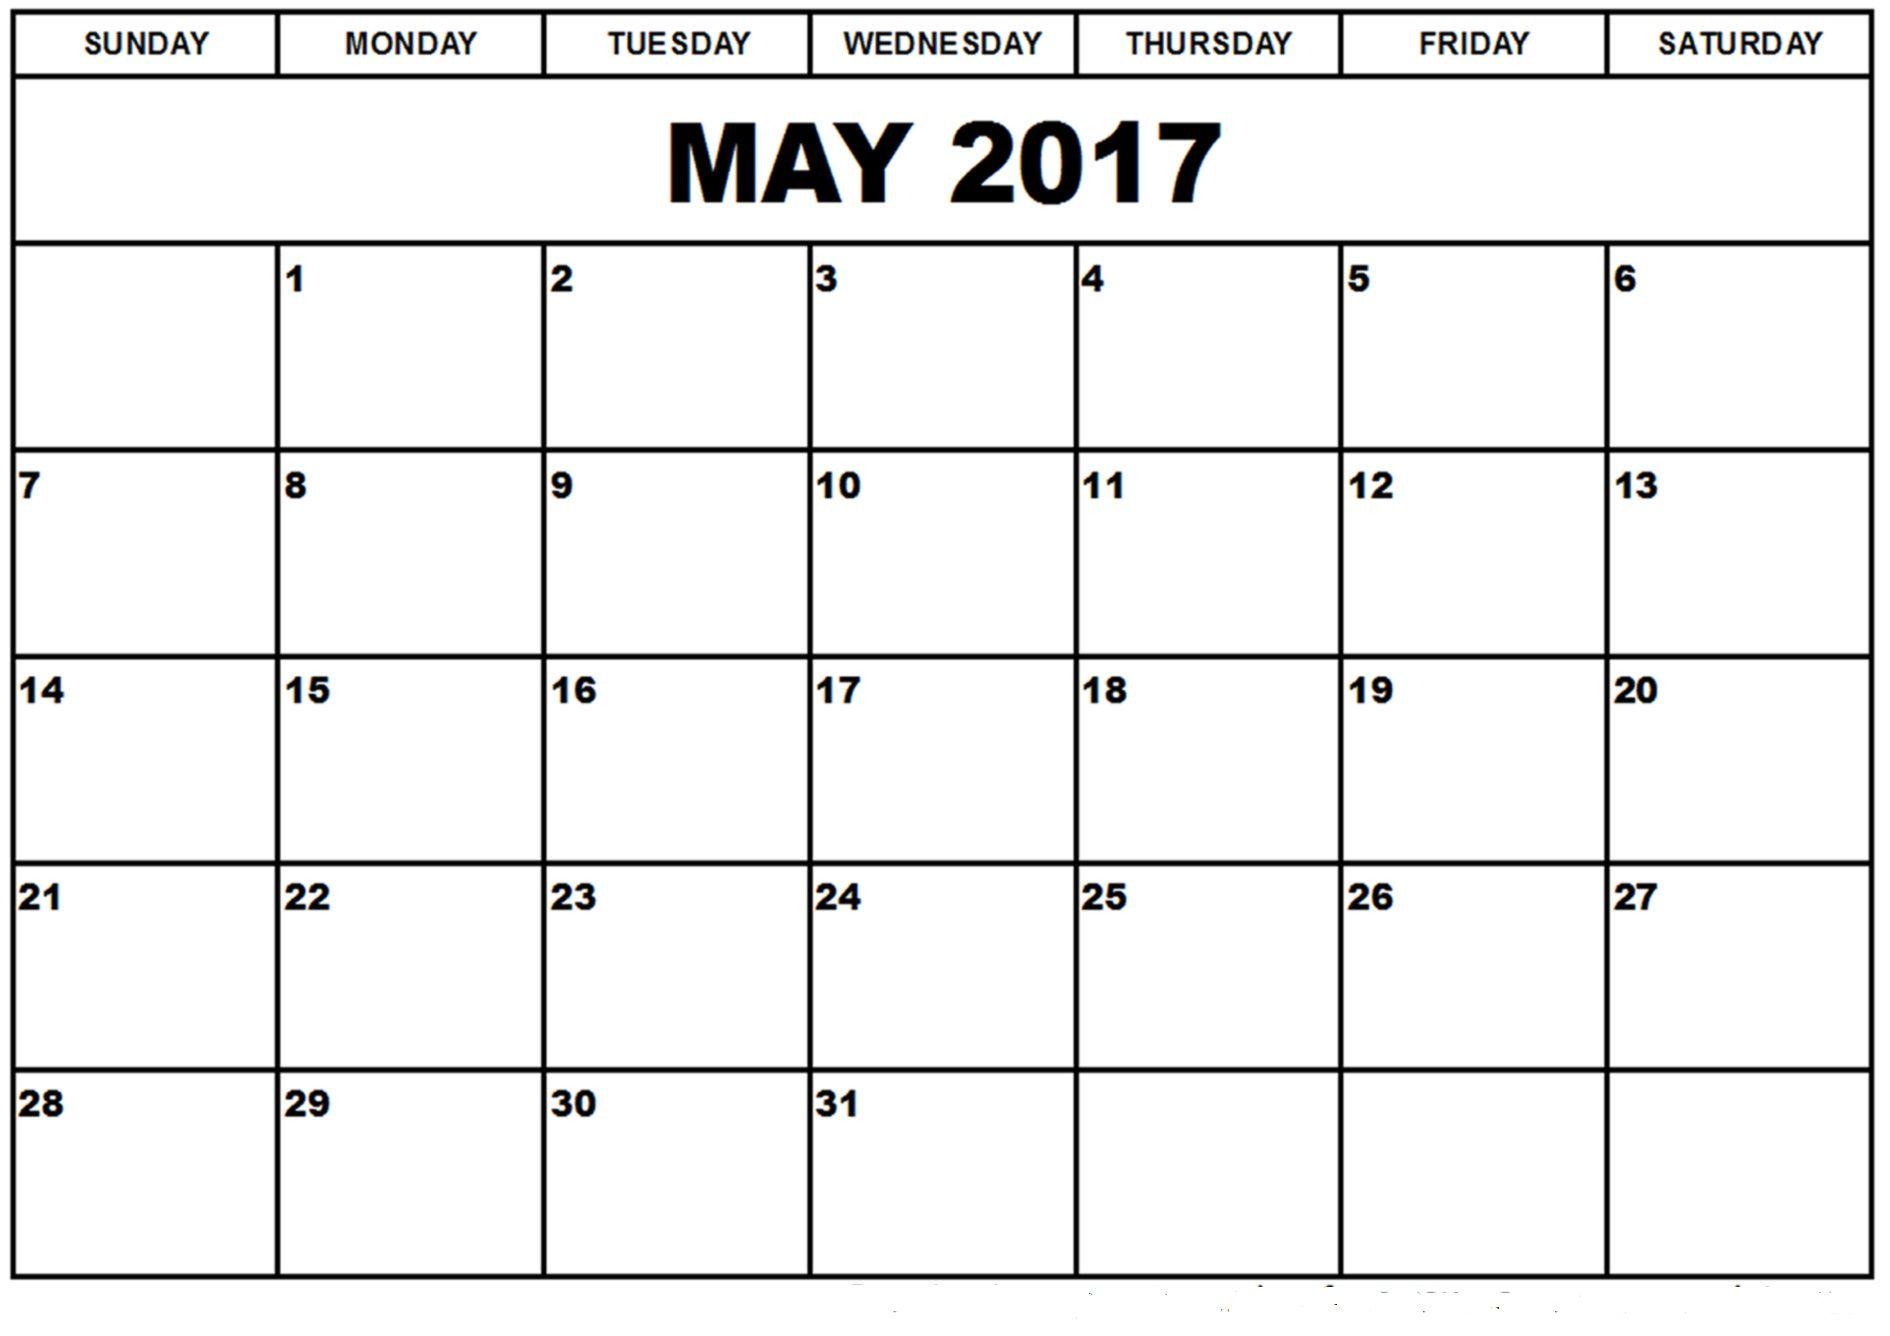 May 2017 Printable Calendar May 2017 Calendar Dekorasyon Cerceve